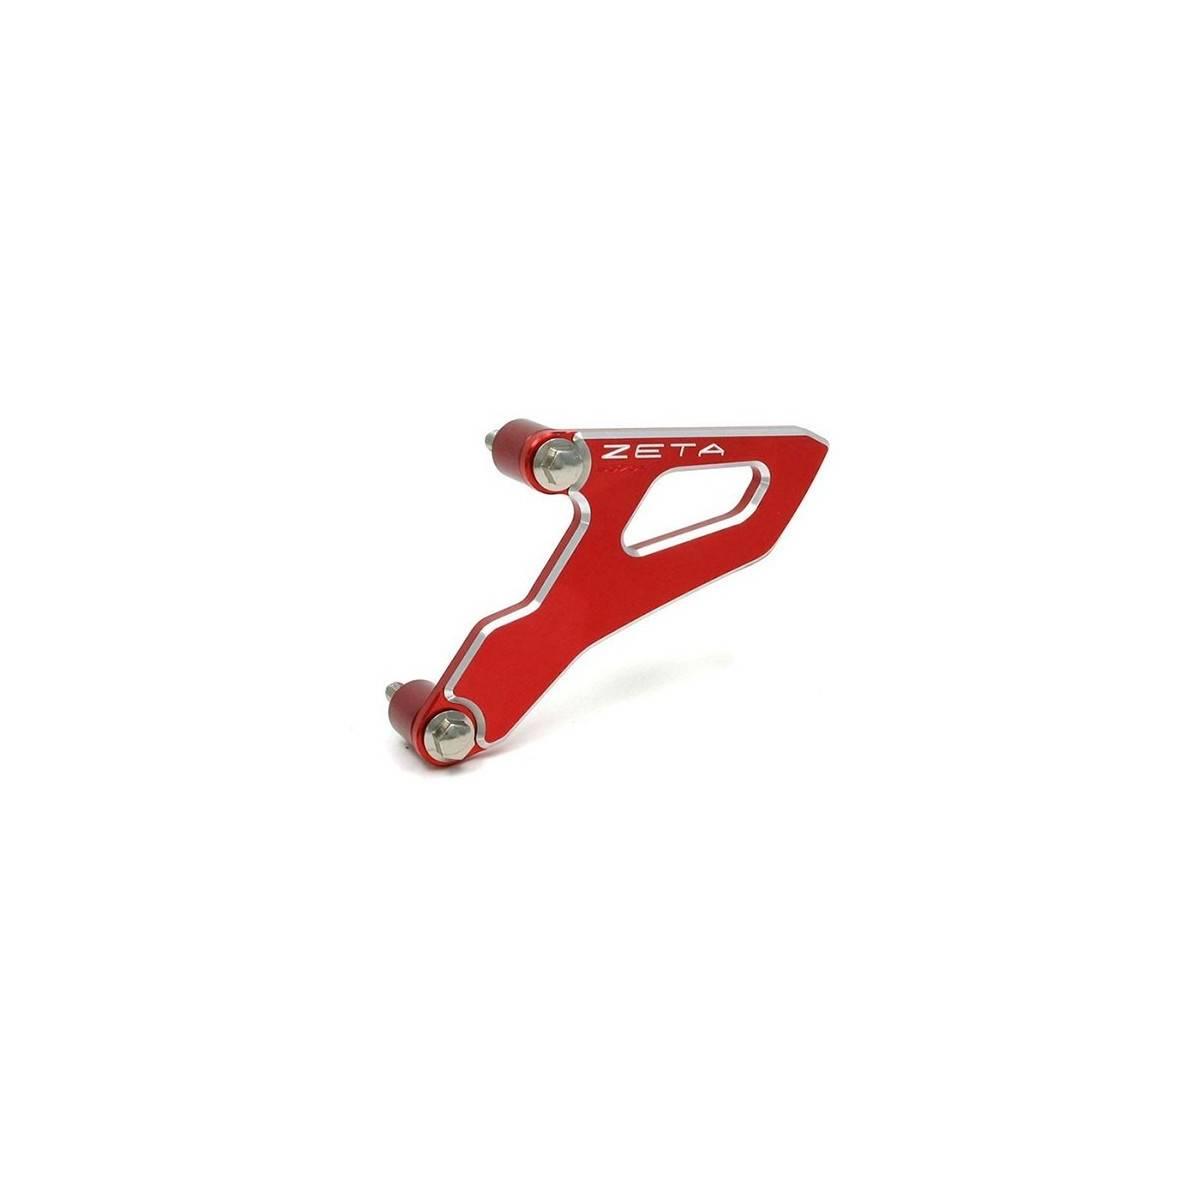 ZE80.9045 - Protector Piñon Salida Zeta Aluminio Crf150R Rojo